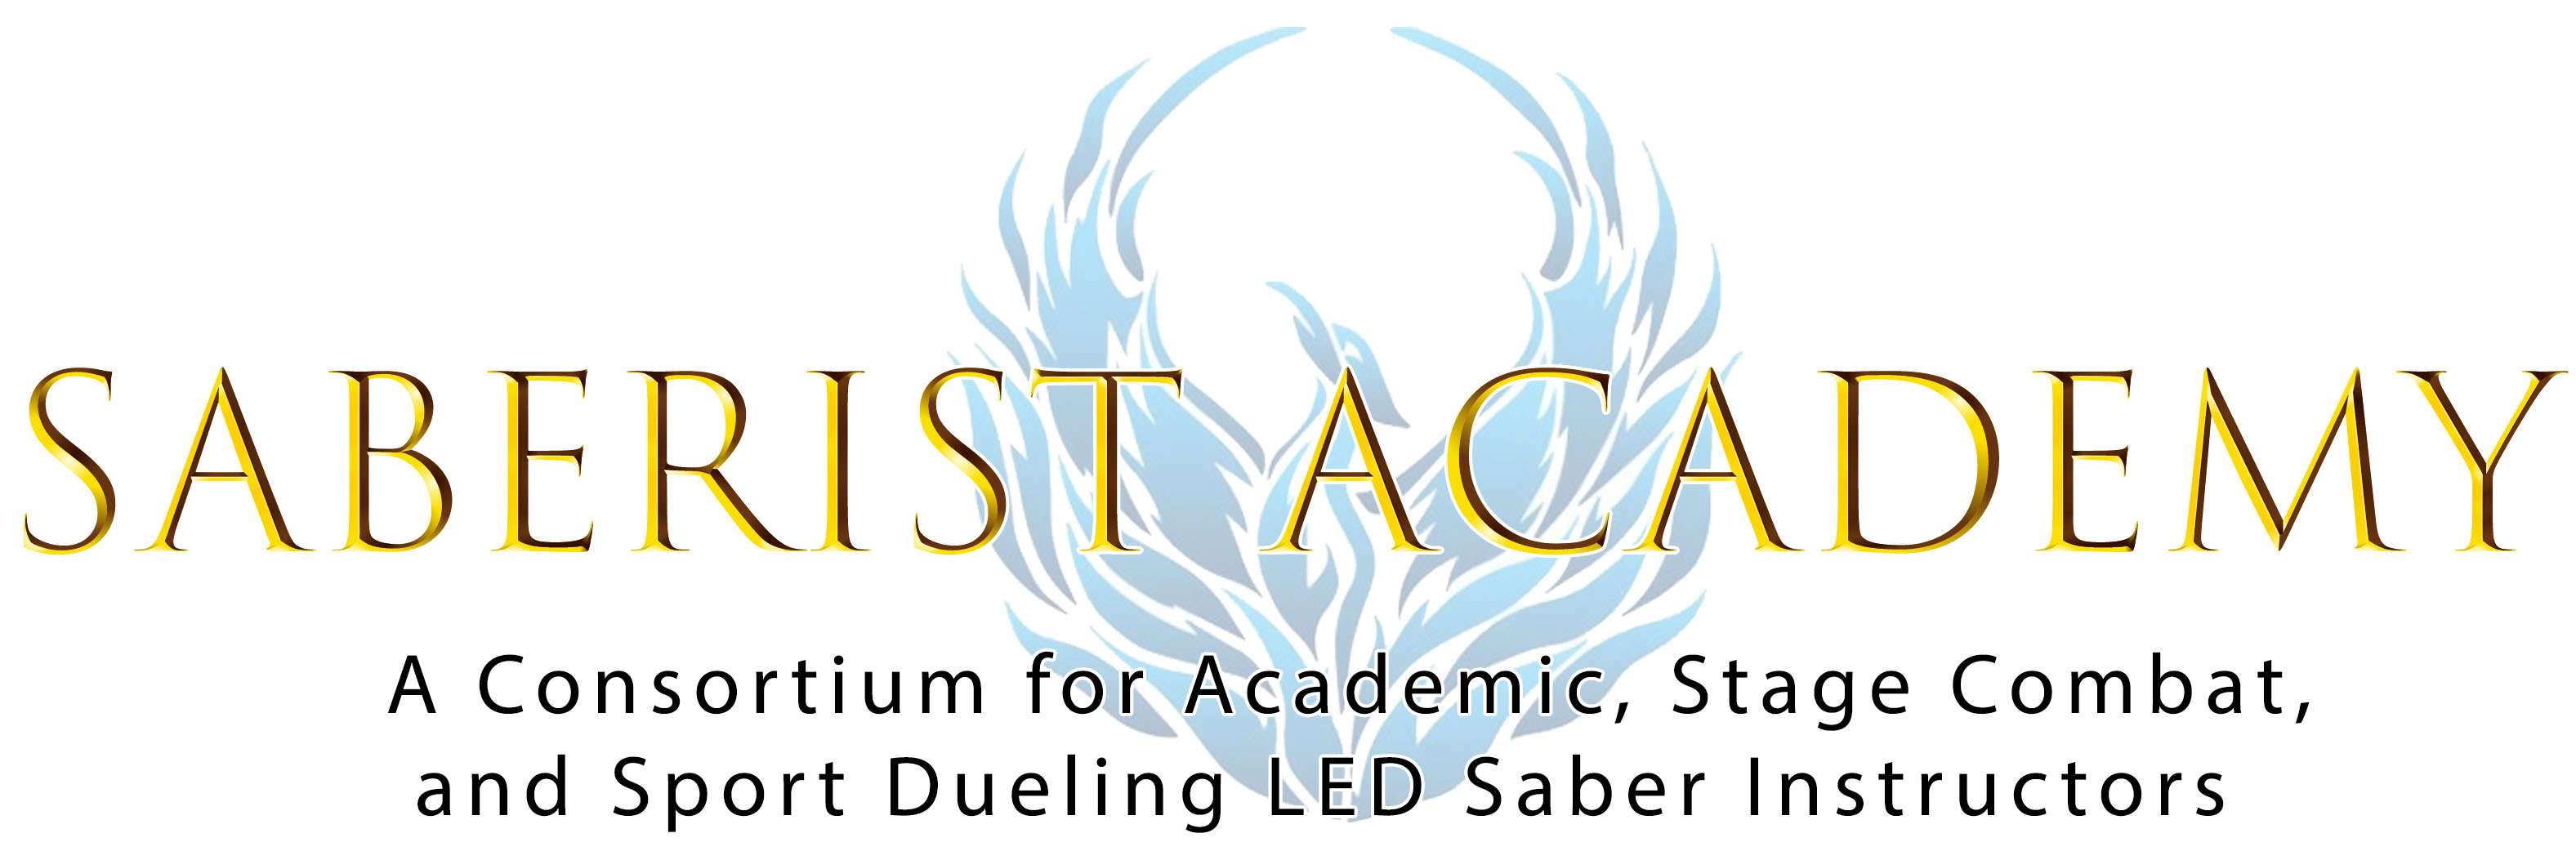 Saberist Academy